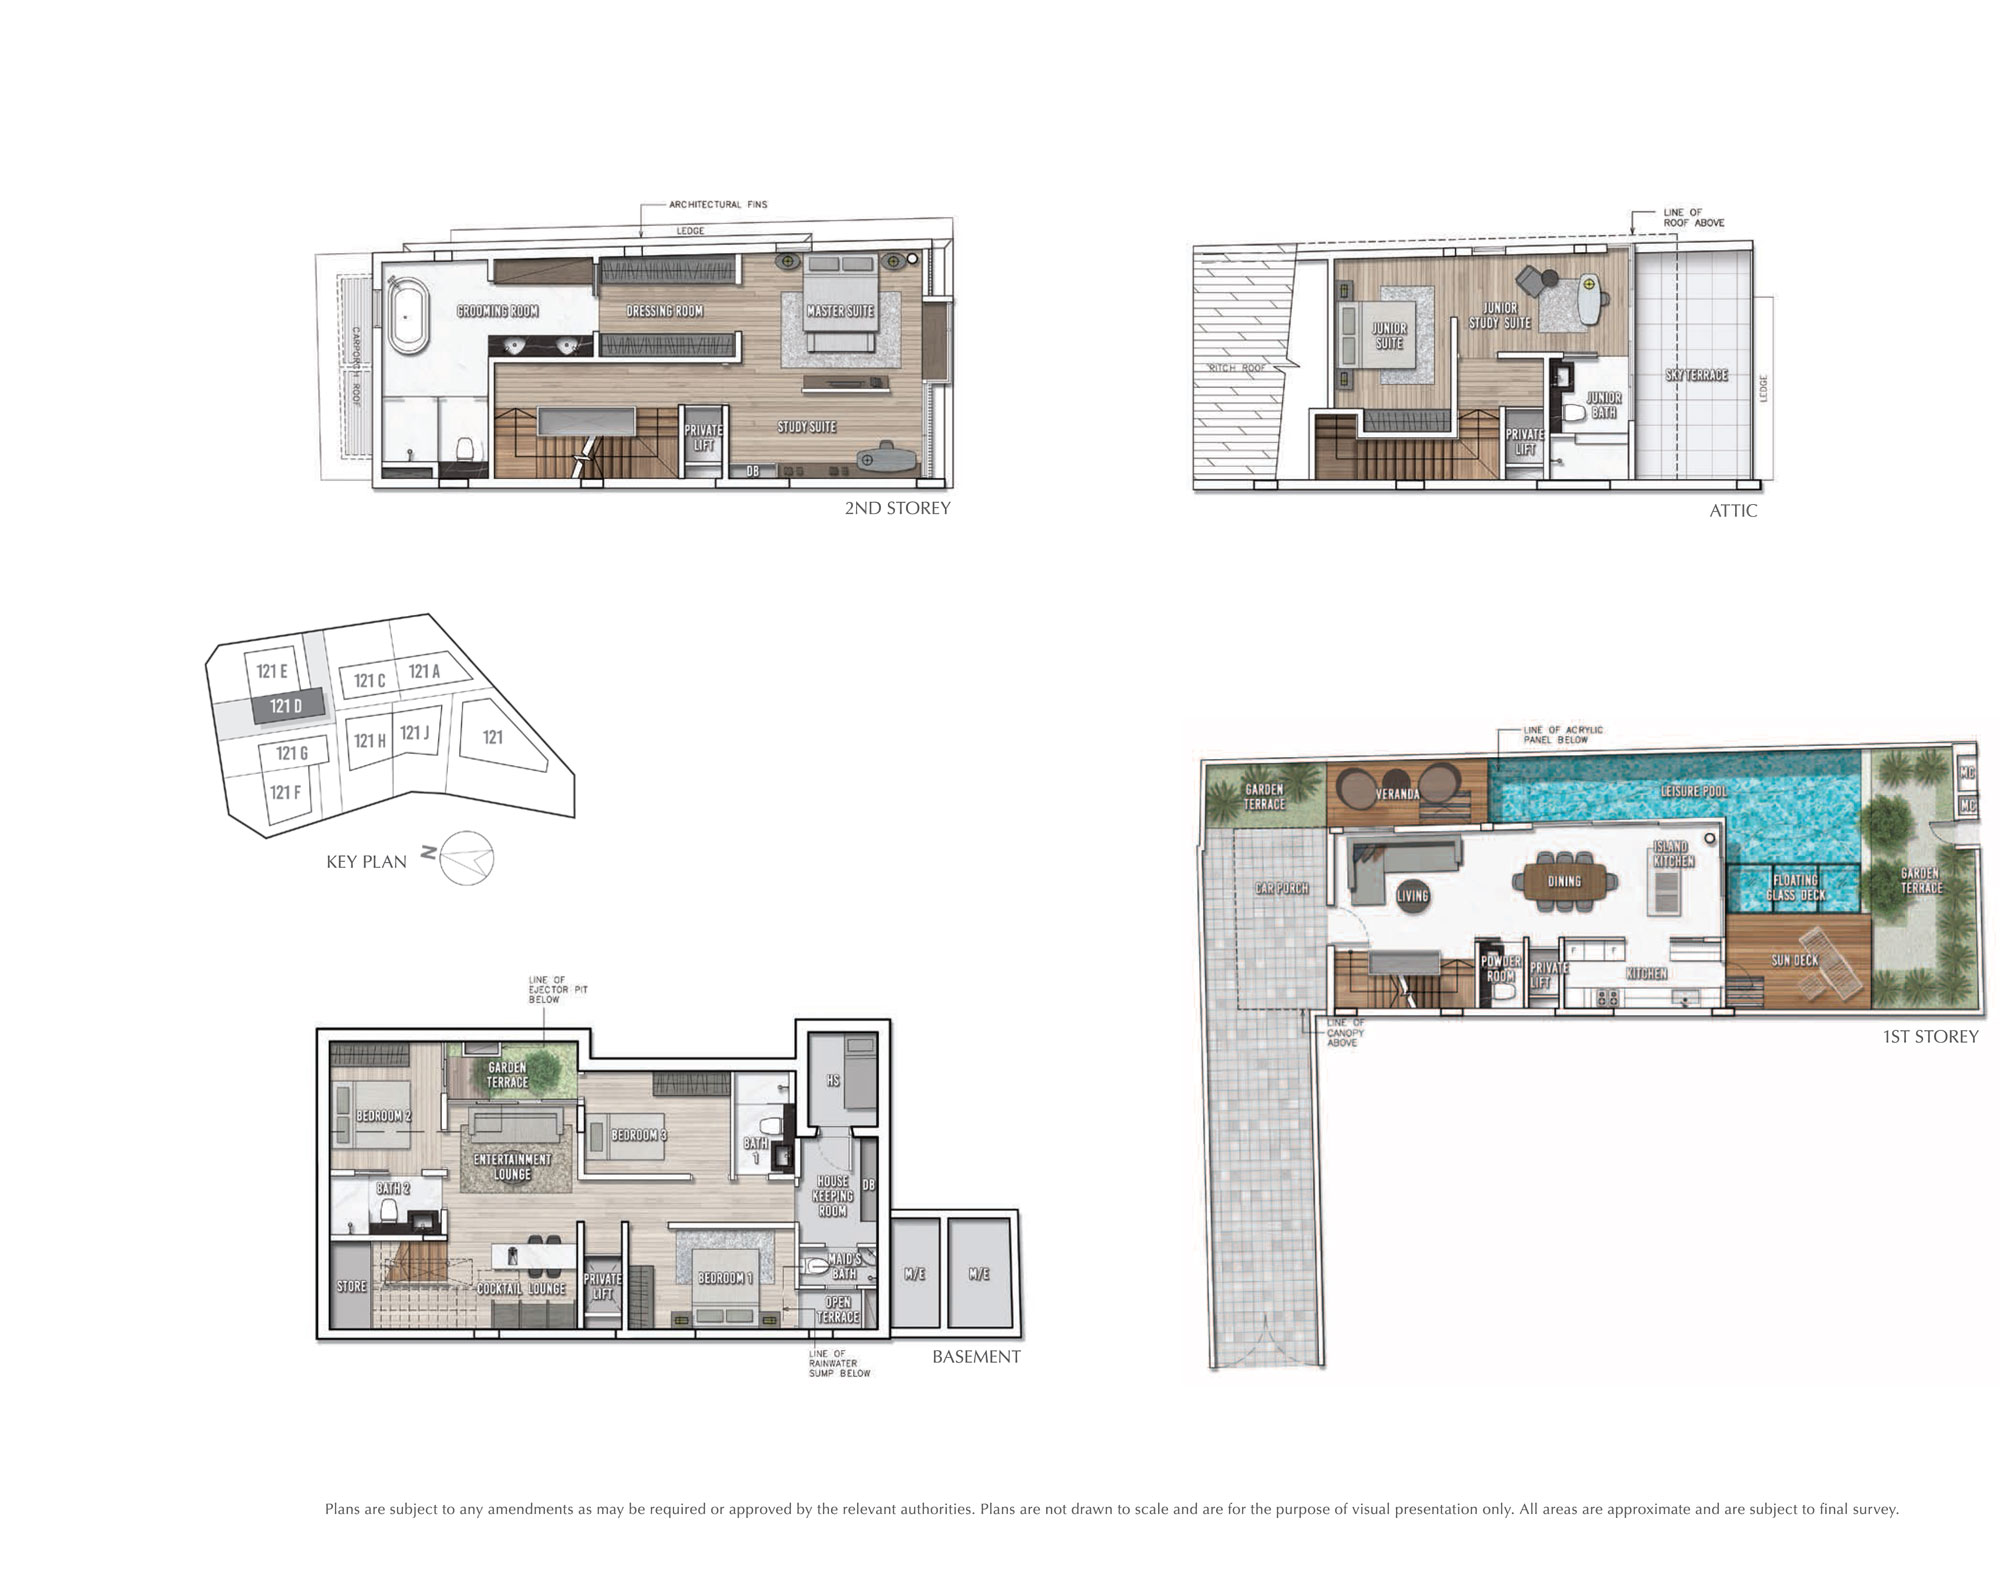 03_121d-whitley-road-plan